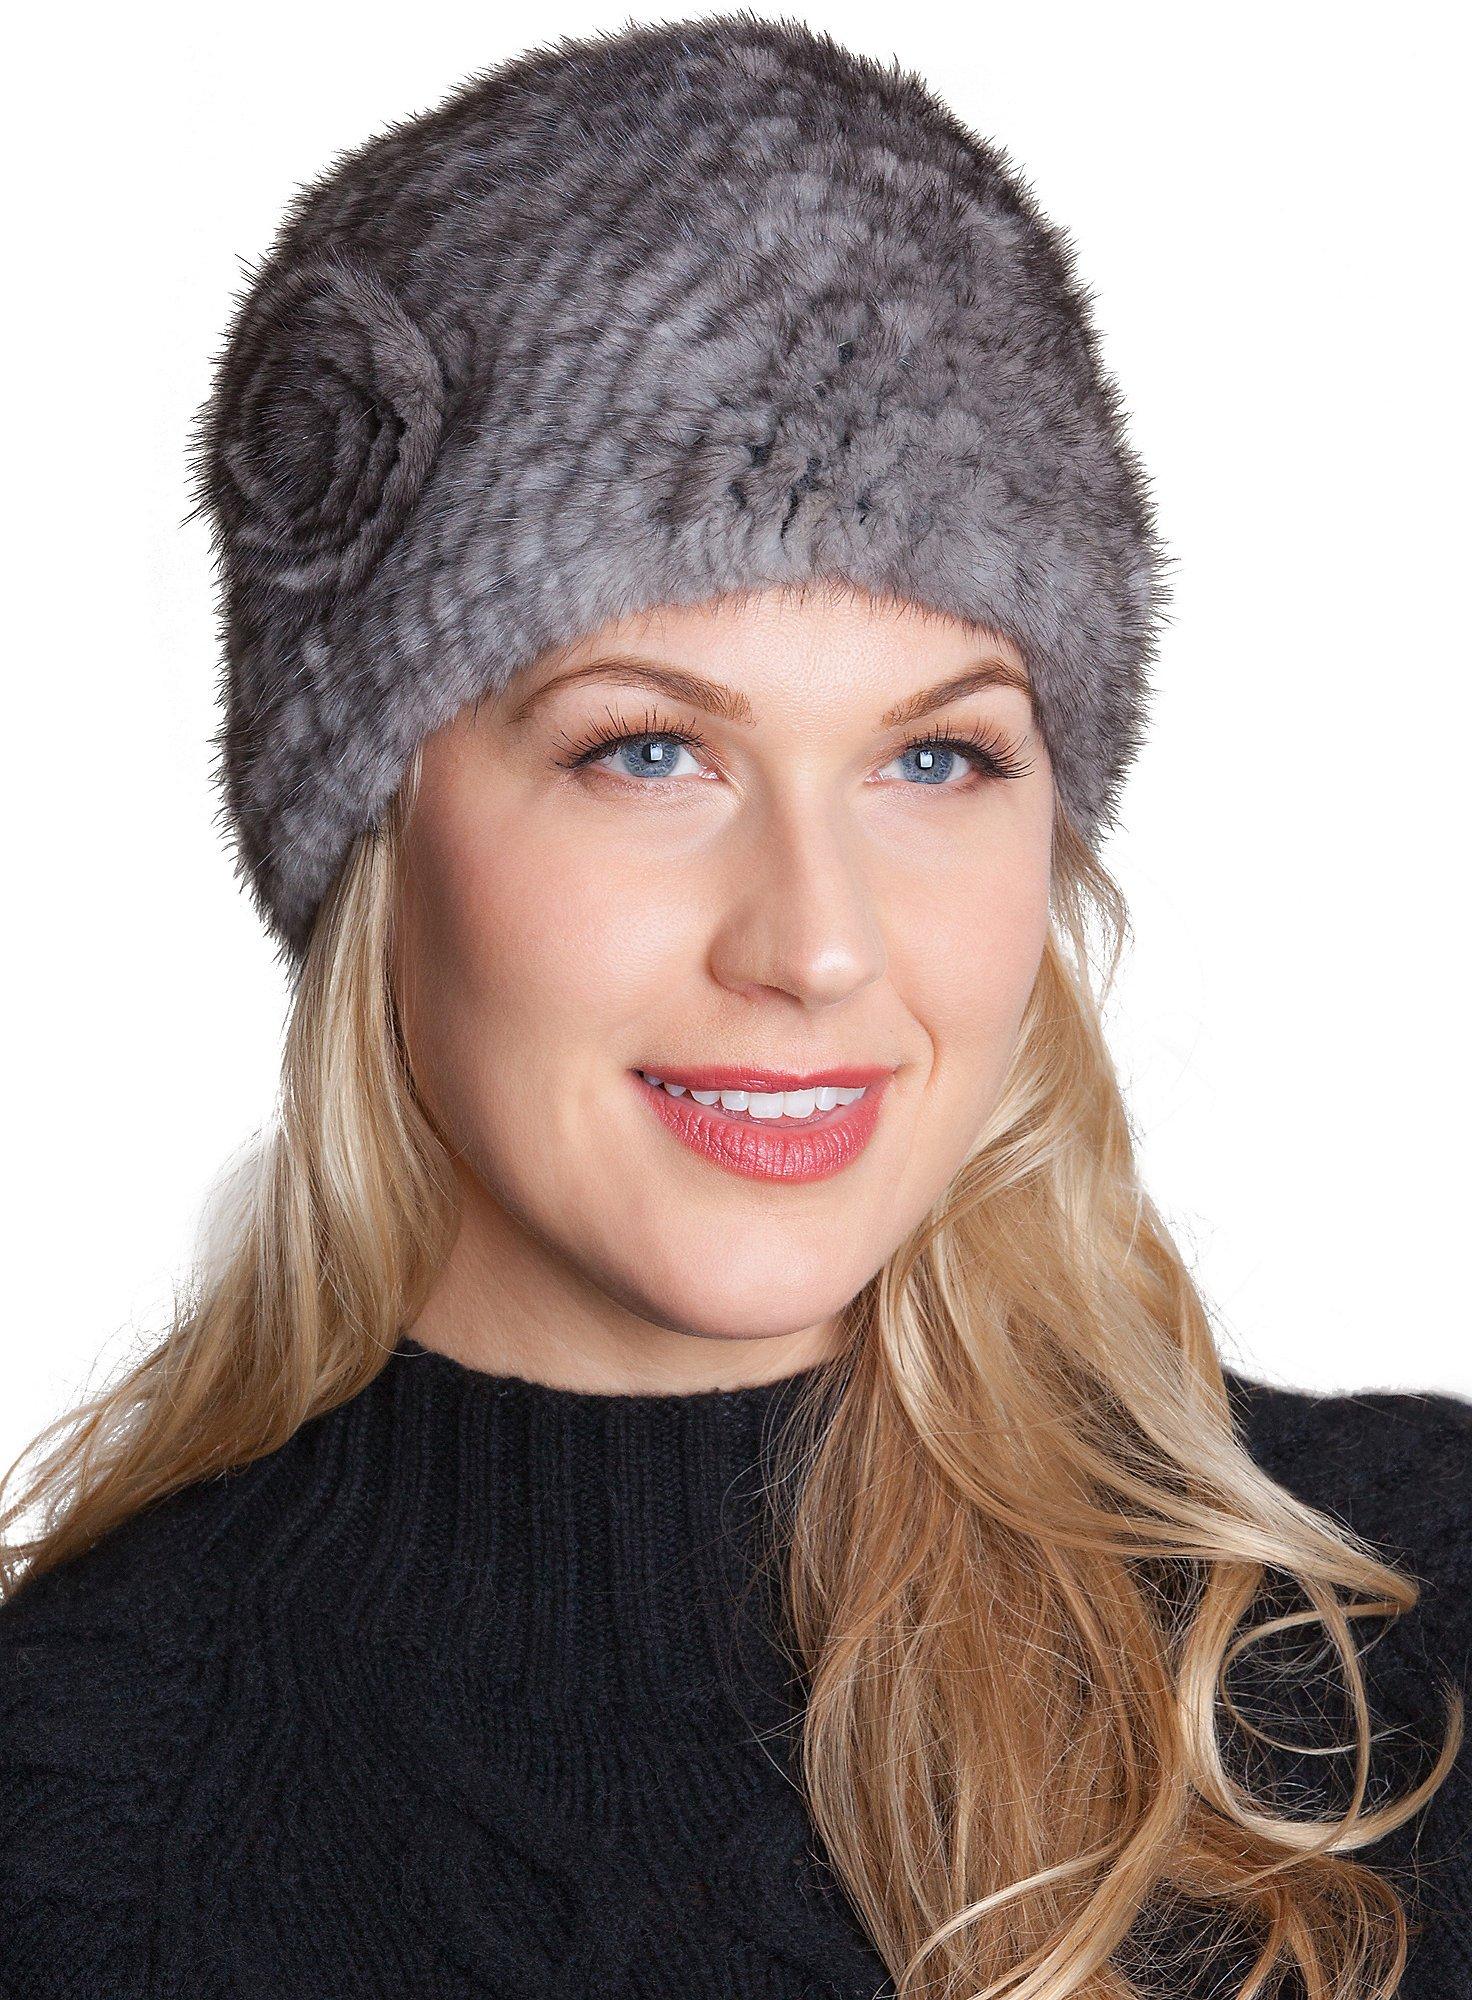 Overland Sheepskin Co. Knitted Mink Fur Beanie Hat With Fur Flower, Blue Iris, Size 1 Size